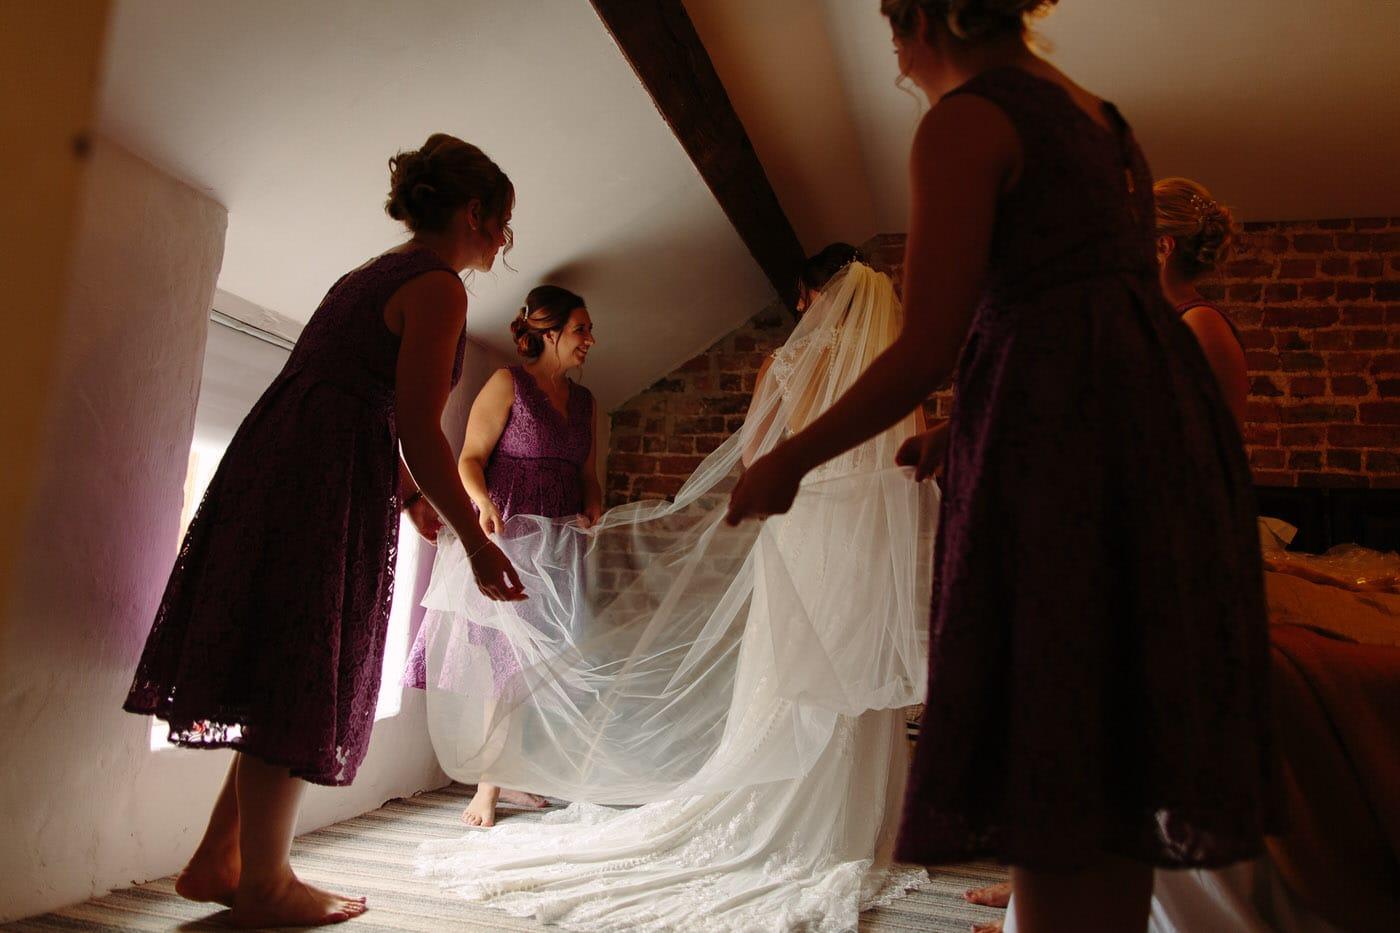 AA PENTREMAWRNORTH WALES WEDDING 1327